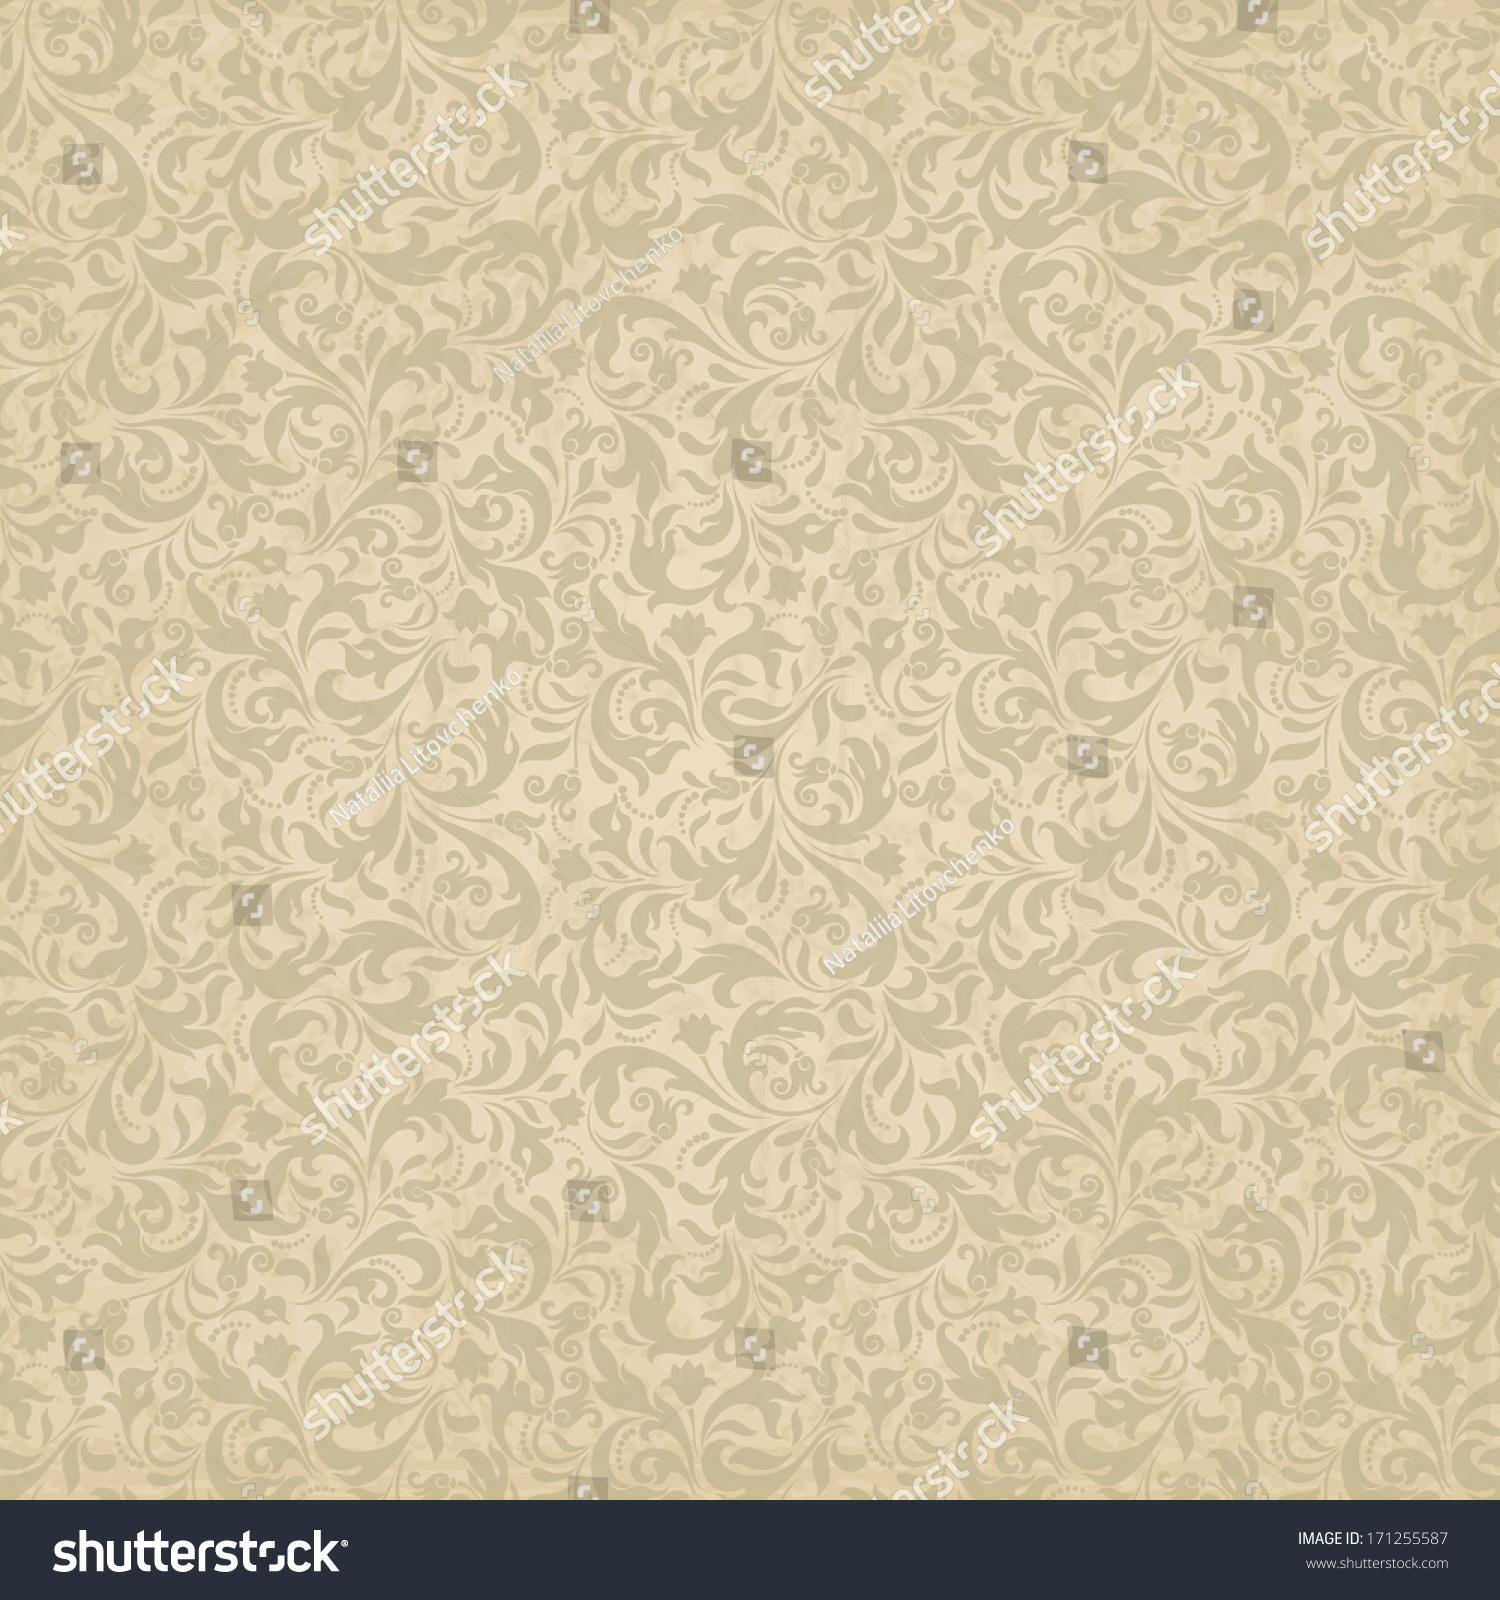 baroque print wallpaper - photo #38